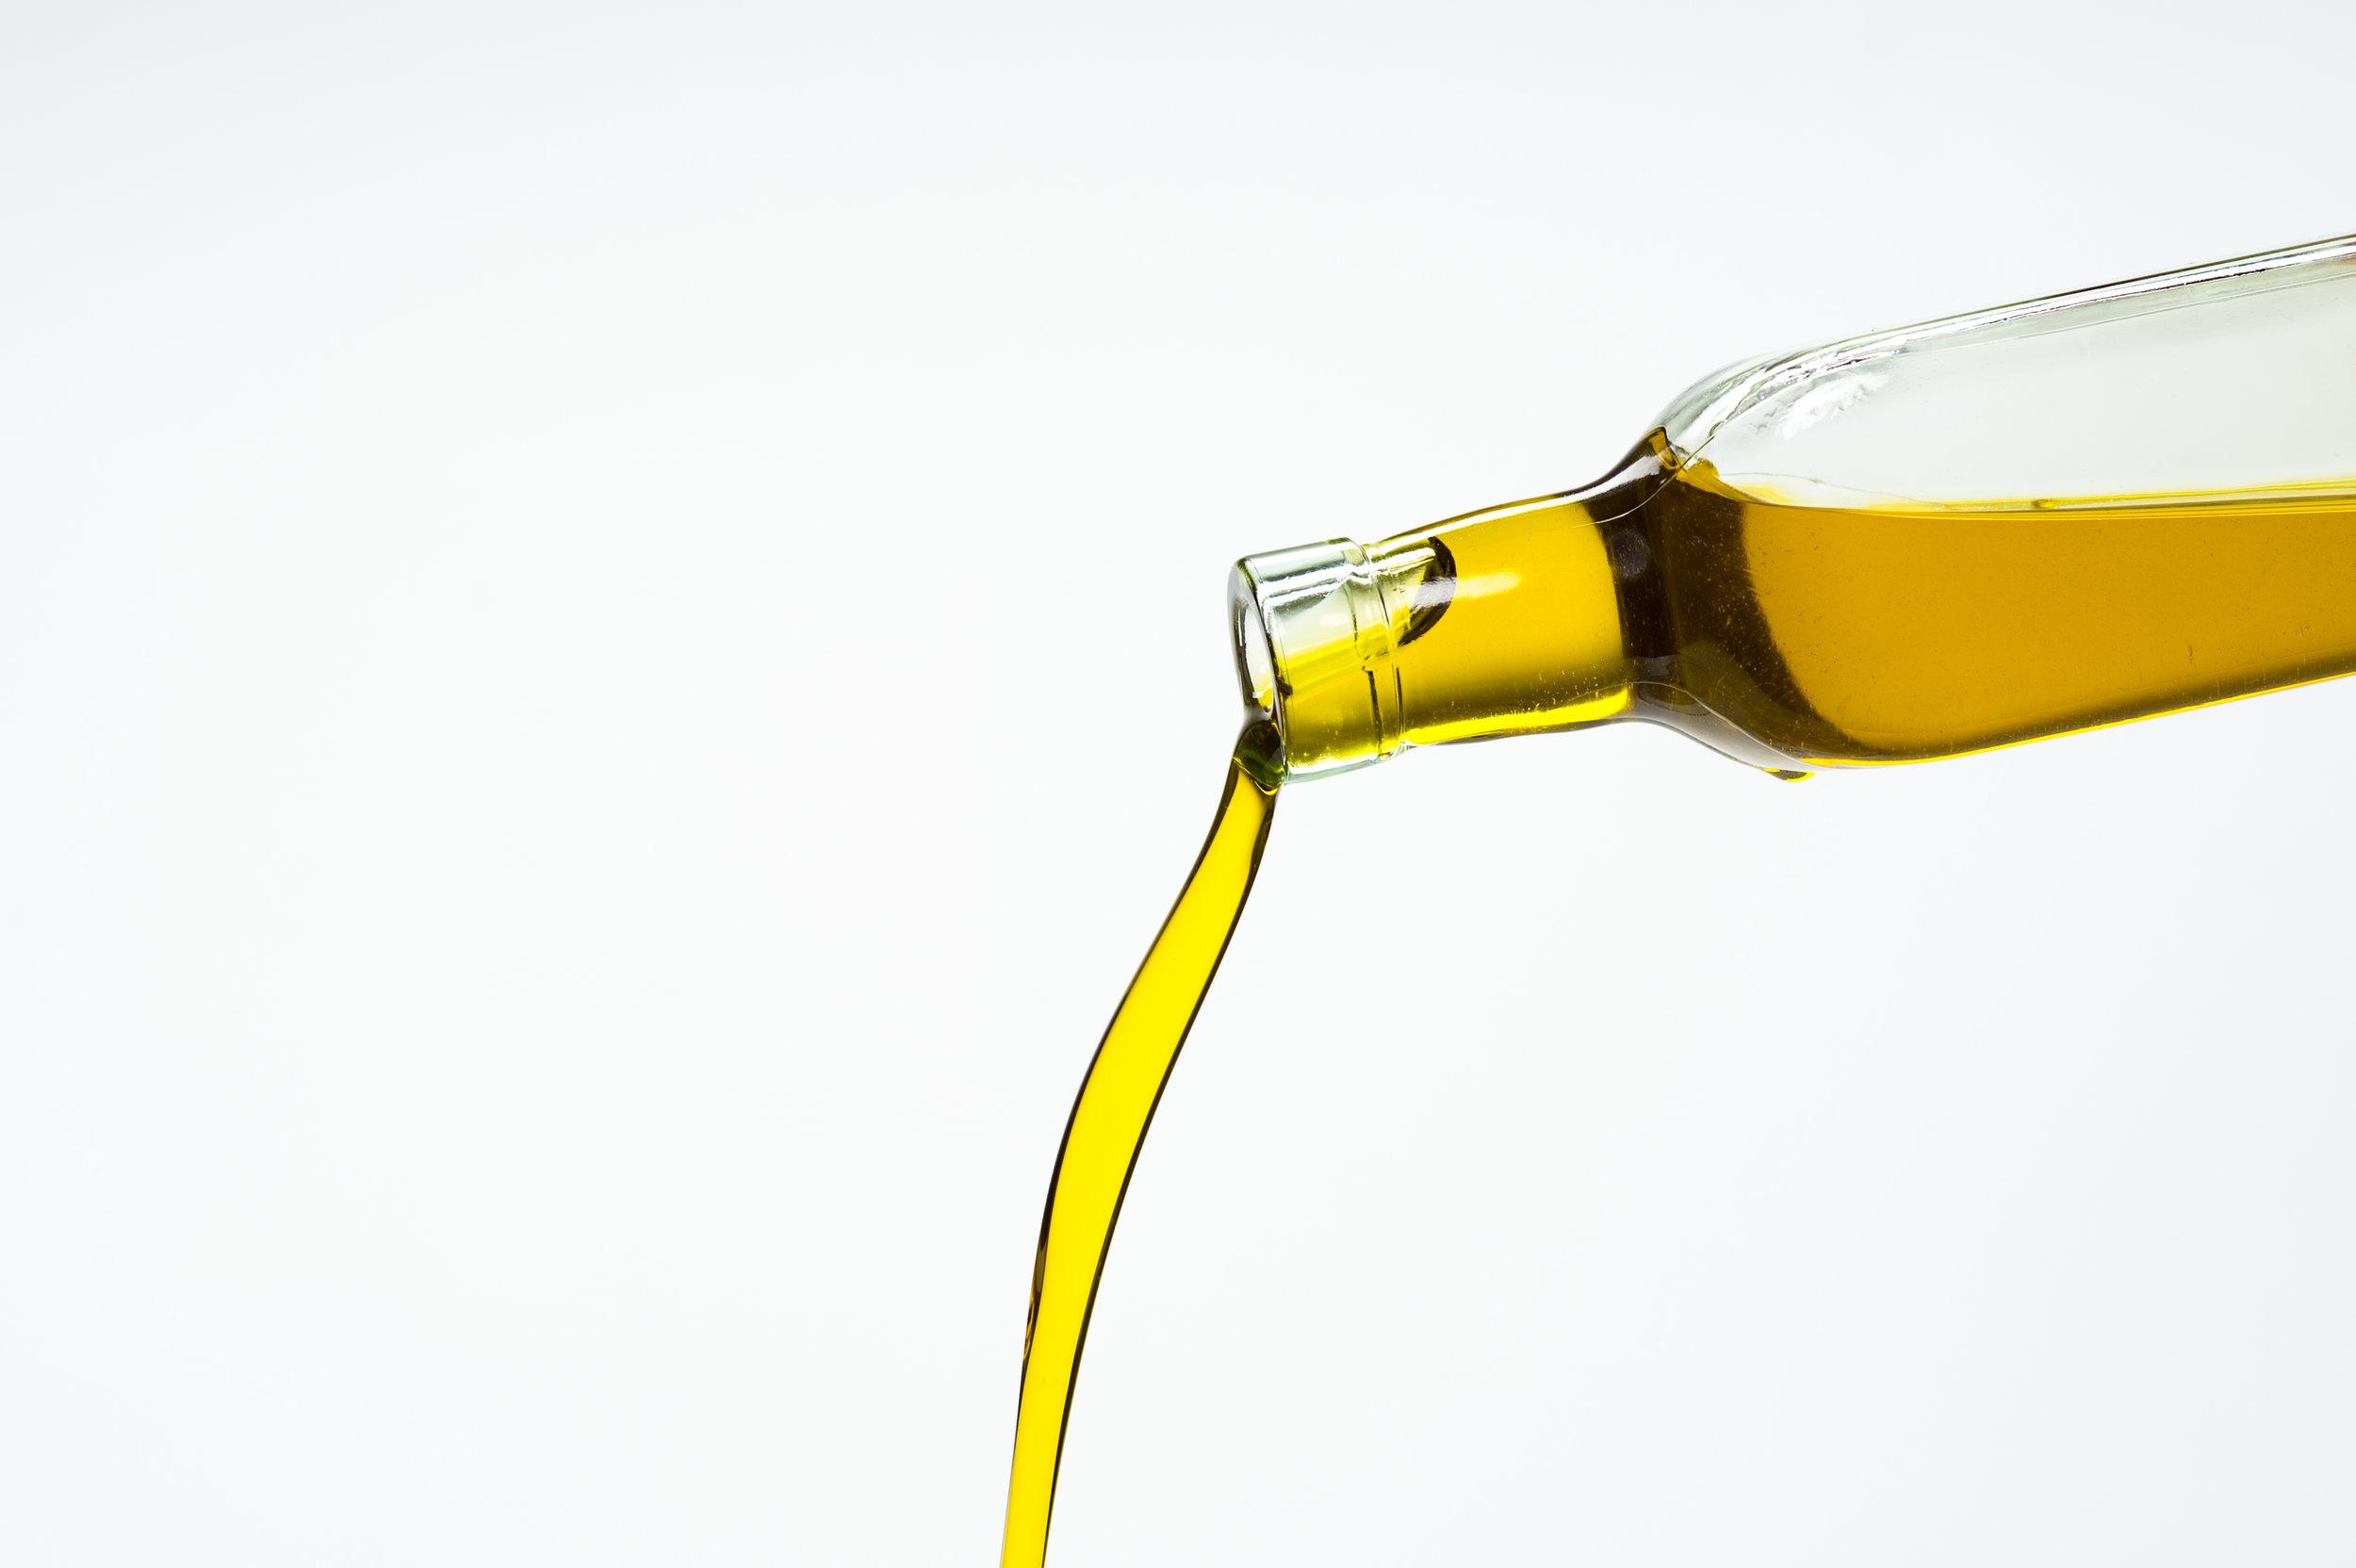 Catania Oil-497-Edit.jpg